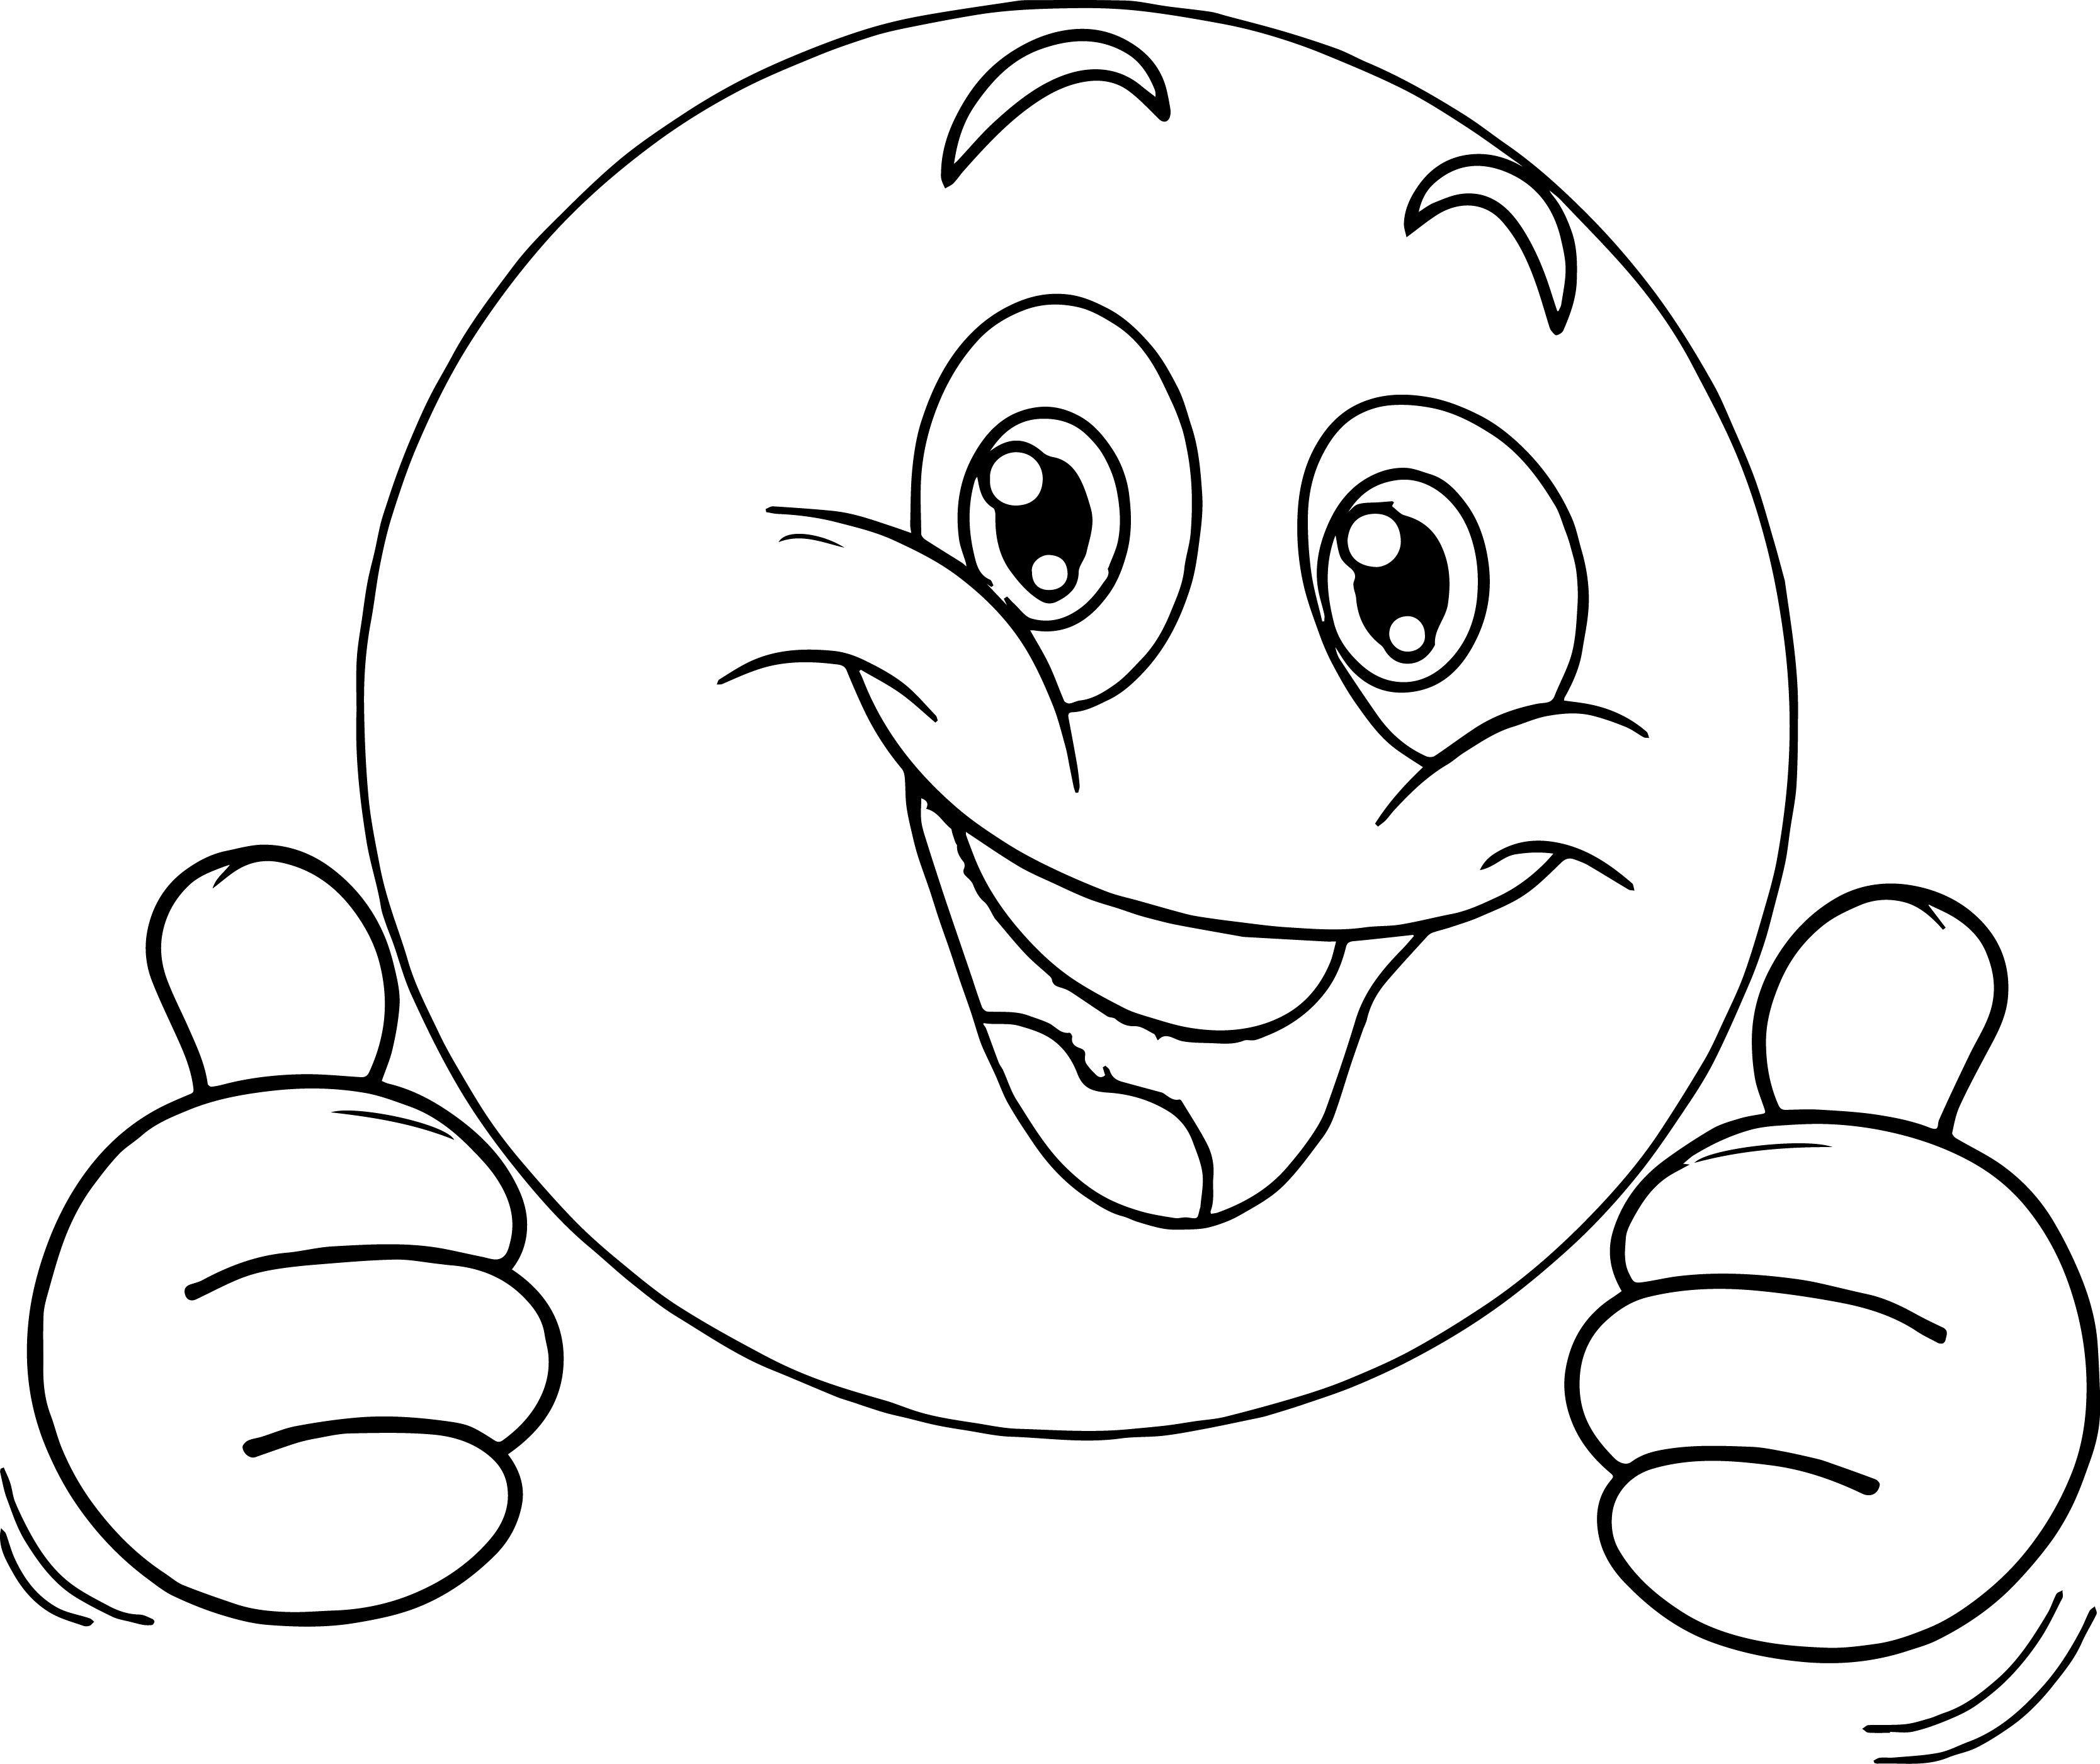 Cool Very Happy Emoticon Face Coloring Page